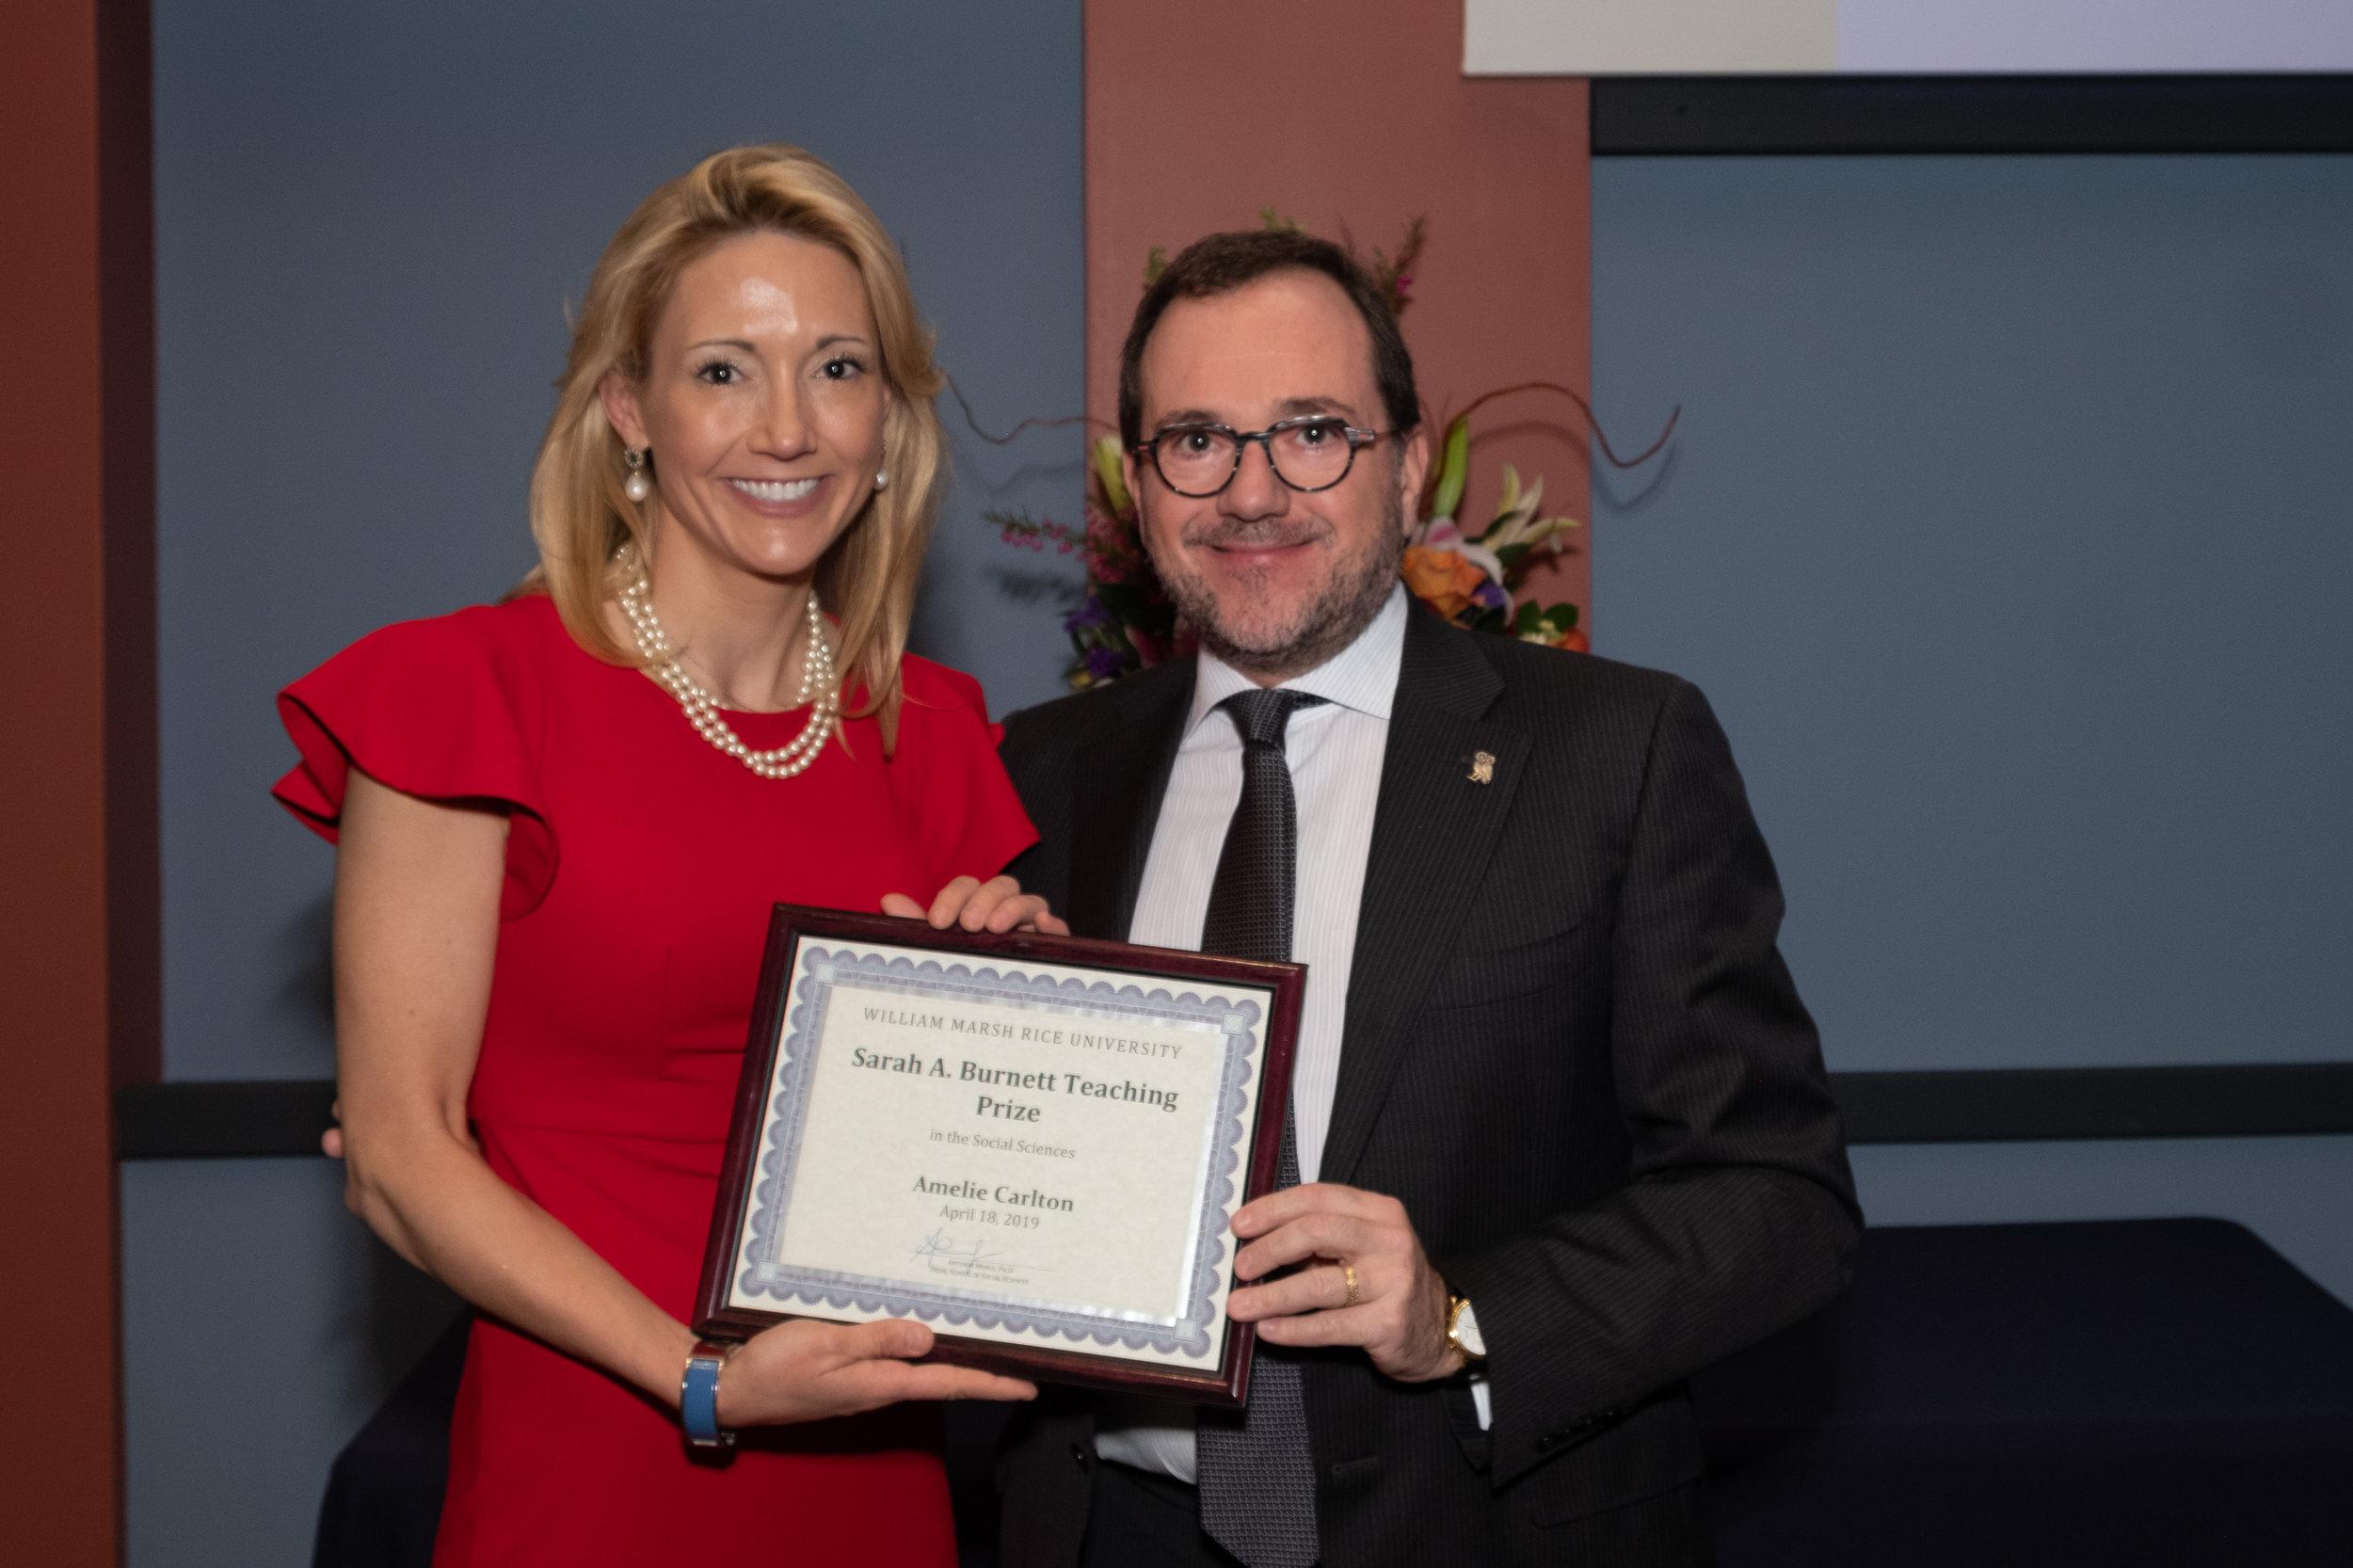 Antonio Merlo, Dean of the School of Social Sciences & Amelie Carlton, Sarah A. Burnett Teaching Prize